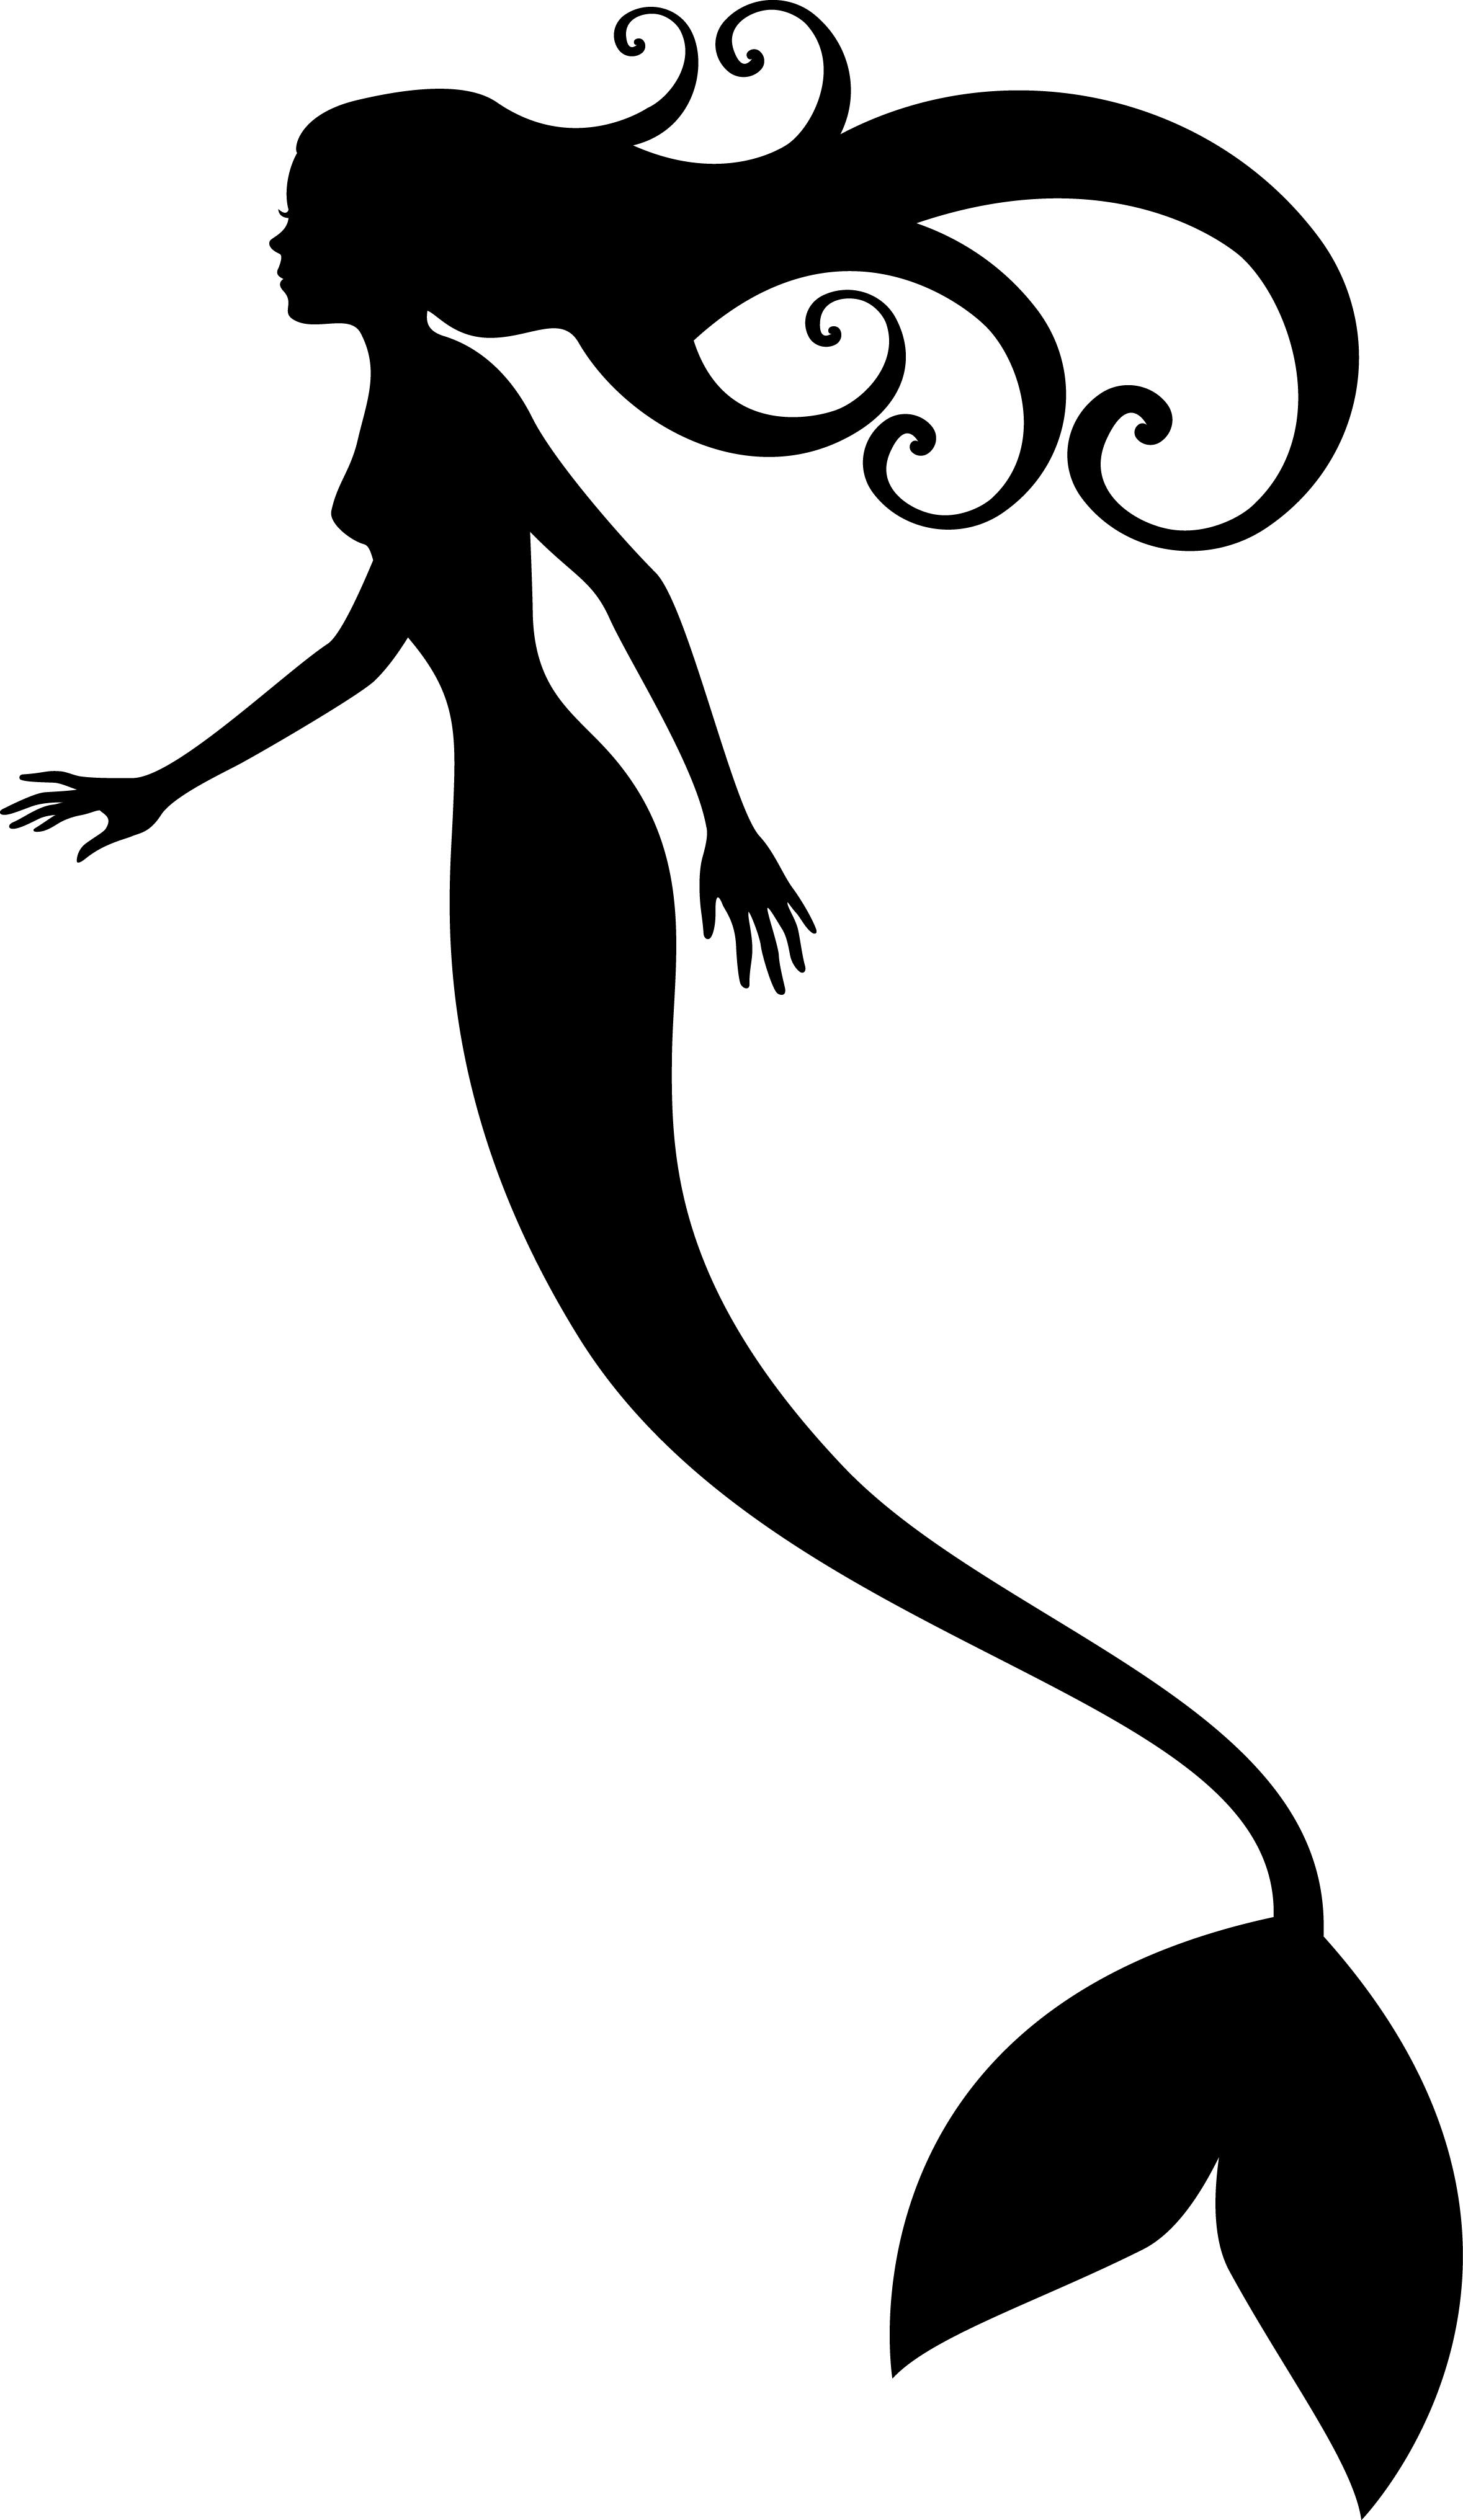 2358x4063 Mermaid Tail Silhouette Mermaidhires Free Images